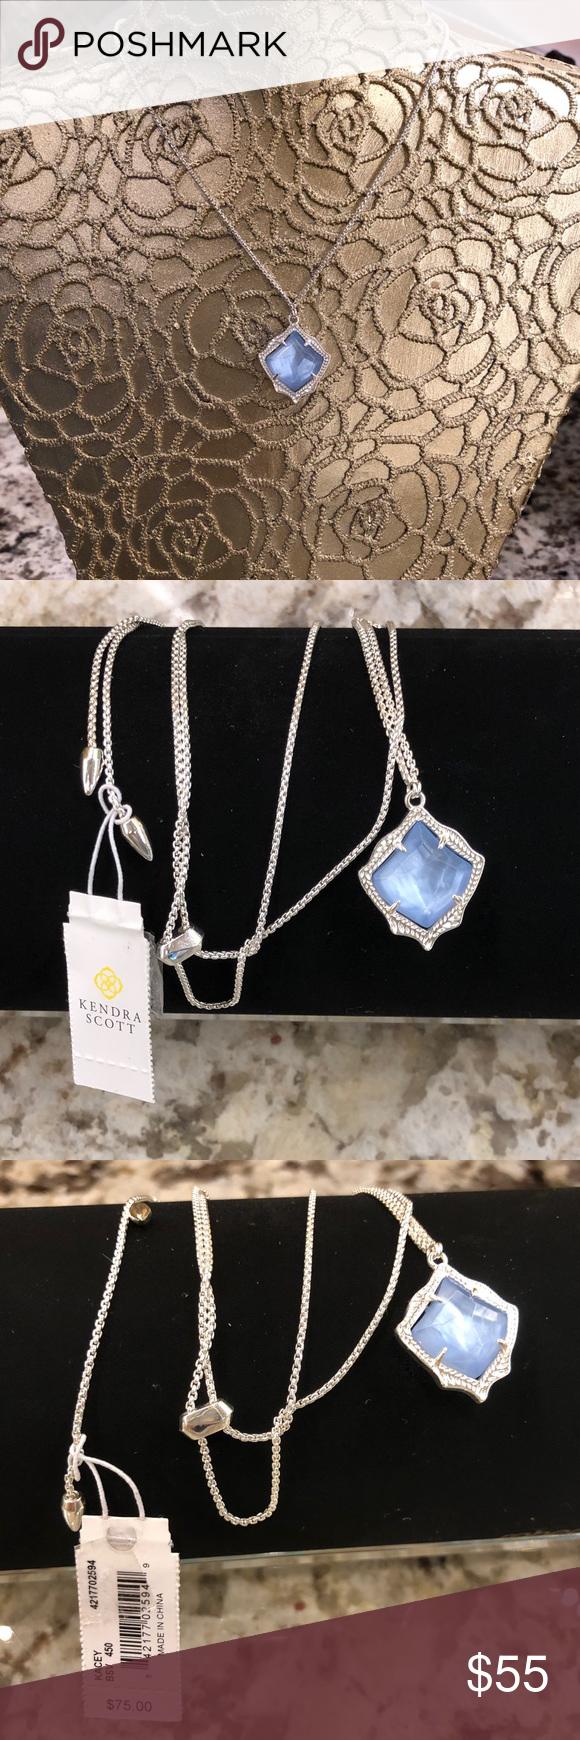 29++ Is kendra scott jewelry made in china ideas